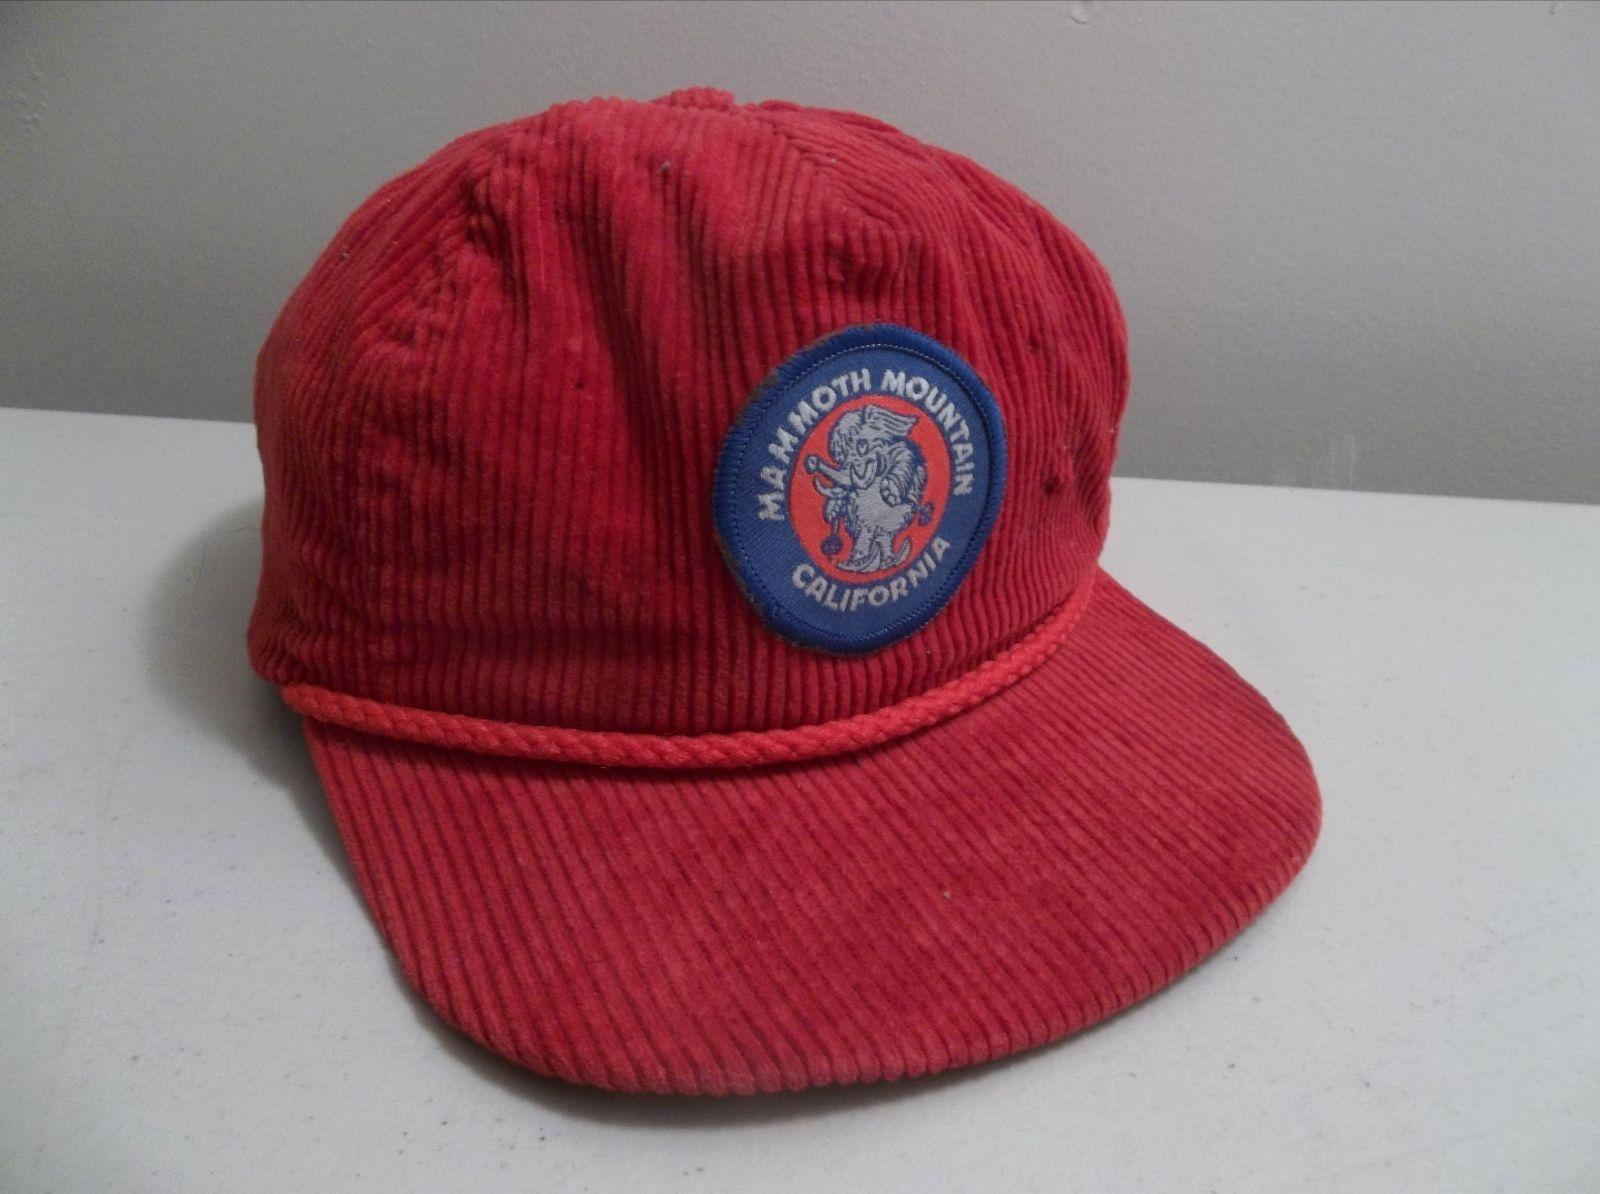 Vintage 1980 s Mammoth Mountain Ski Resort Corduroy Hat Cap  847f4e07851